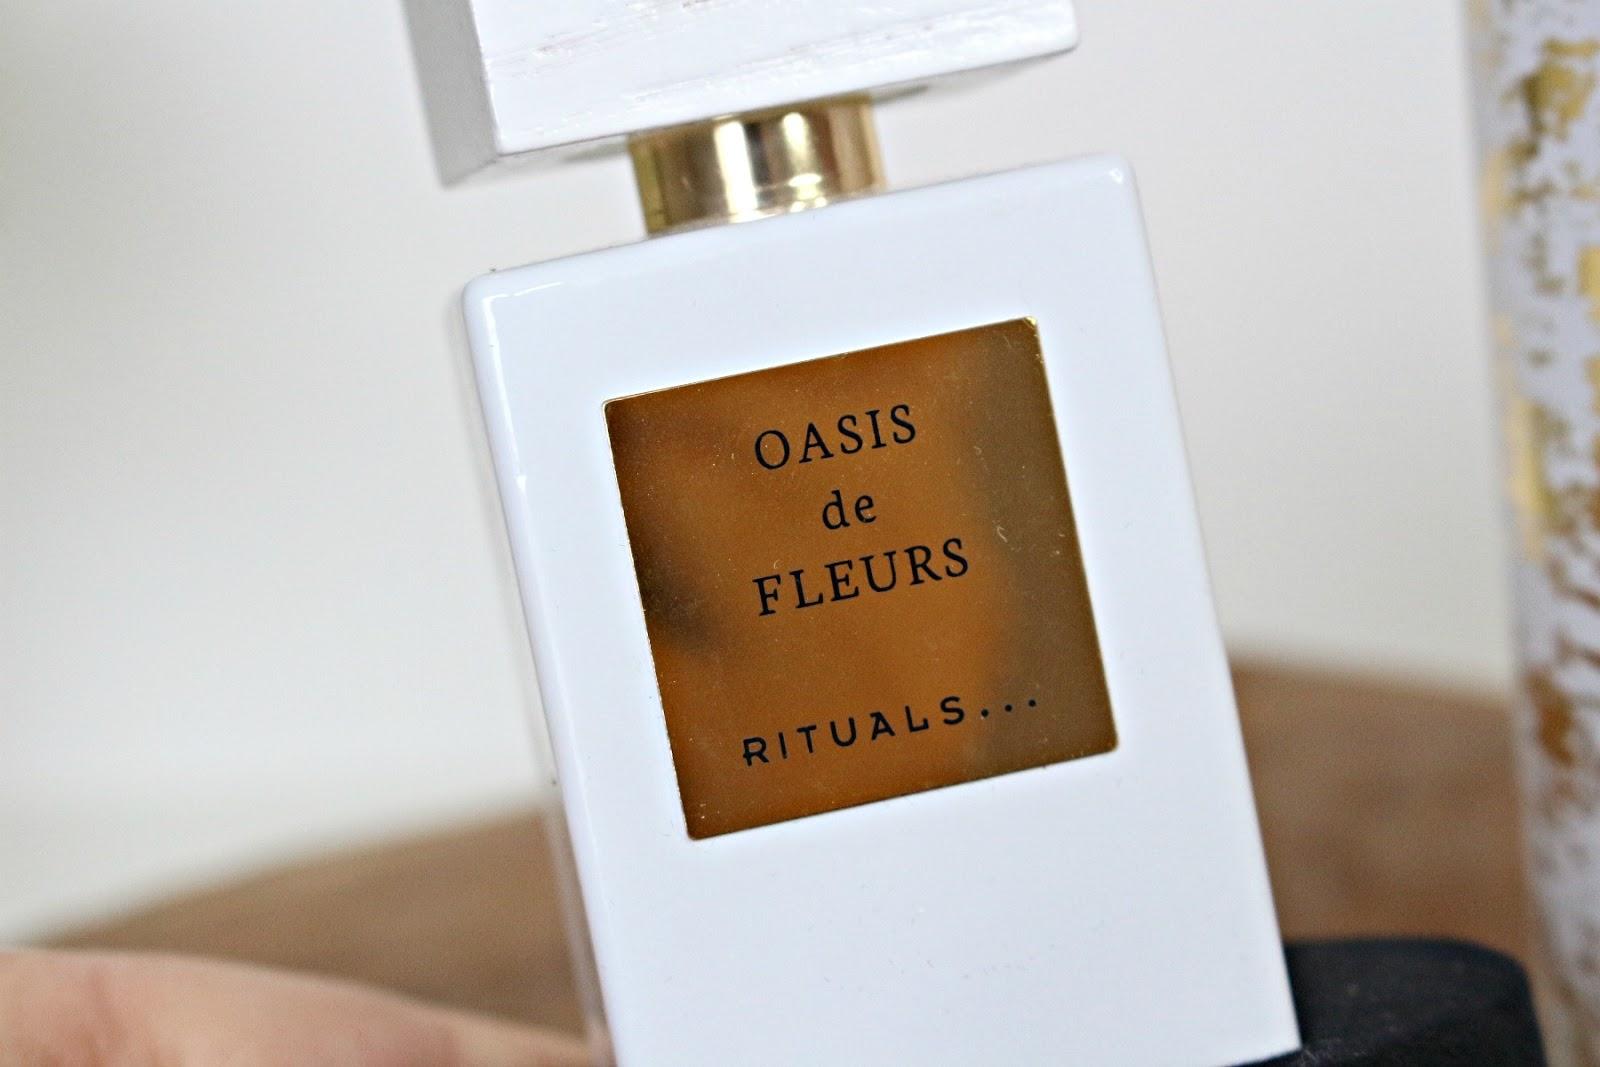 Rituals Oasis de Fleurs